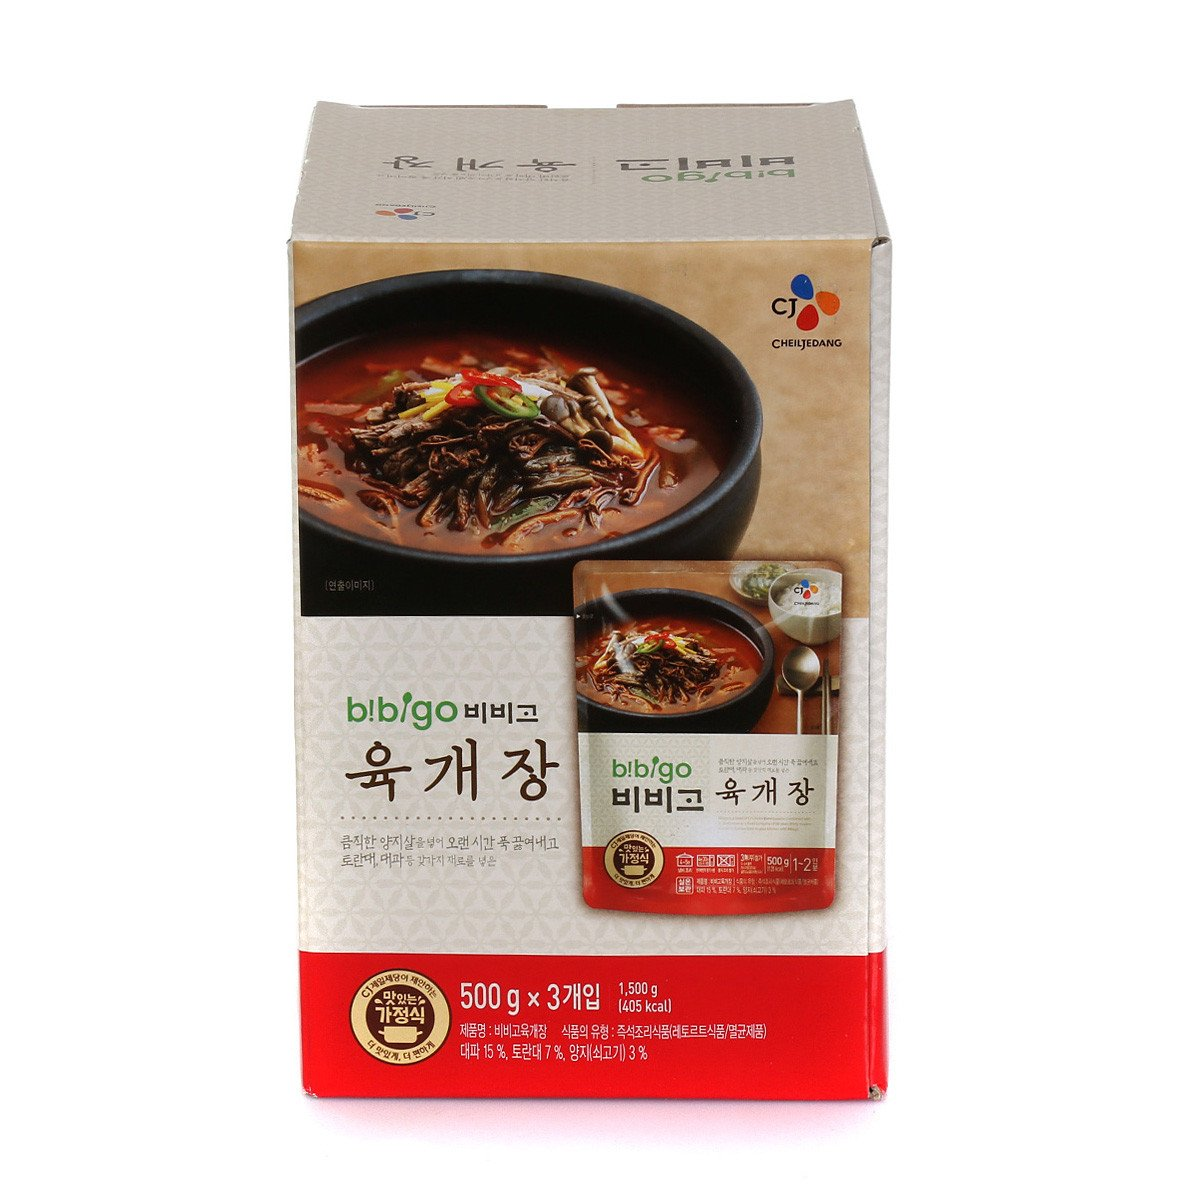 [ 3 Packs ] Korean Bibigo Pre-made Packaged hot spicy meat stew 500g 육개장 by bibigo